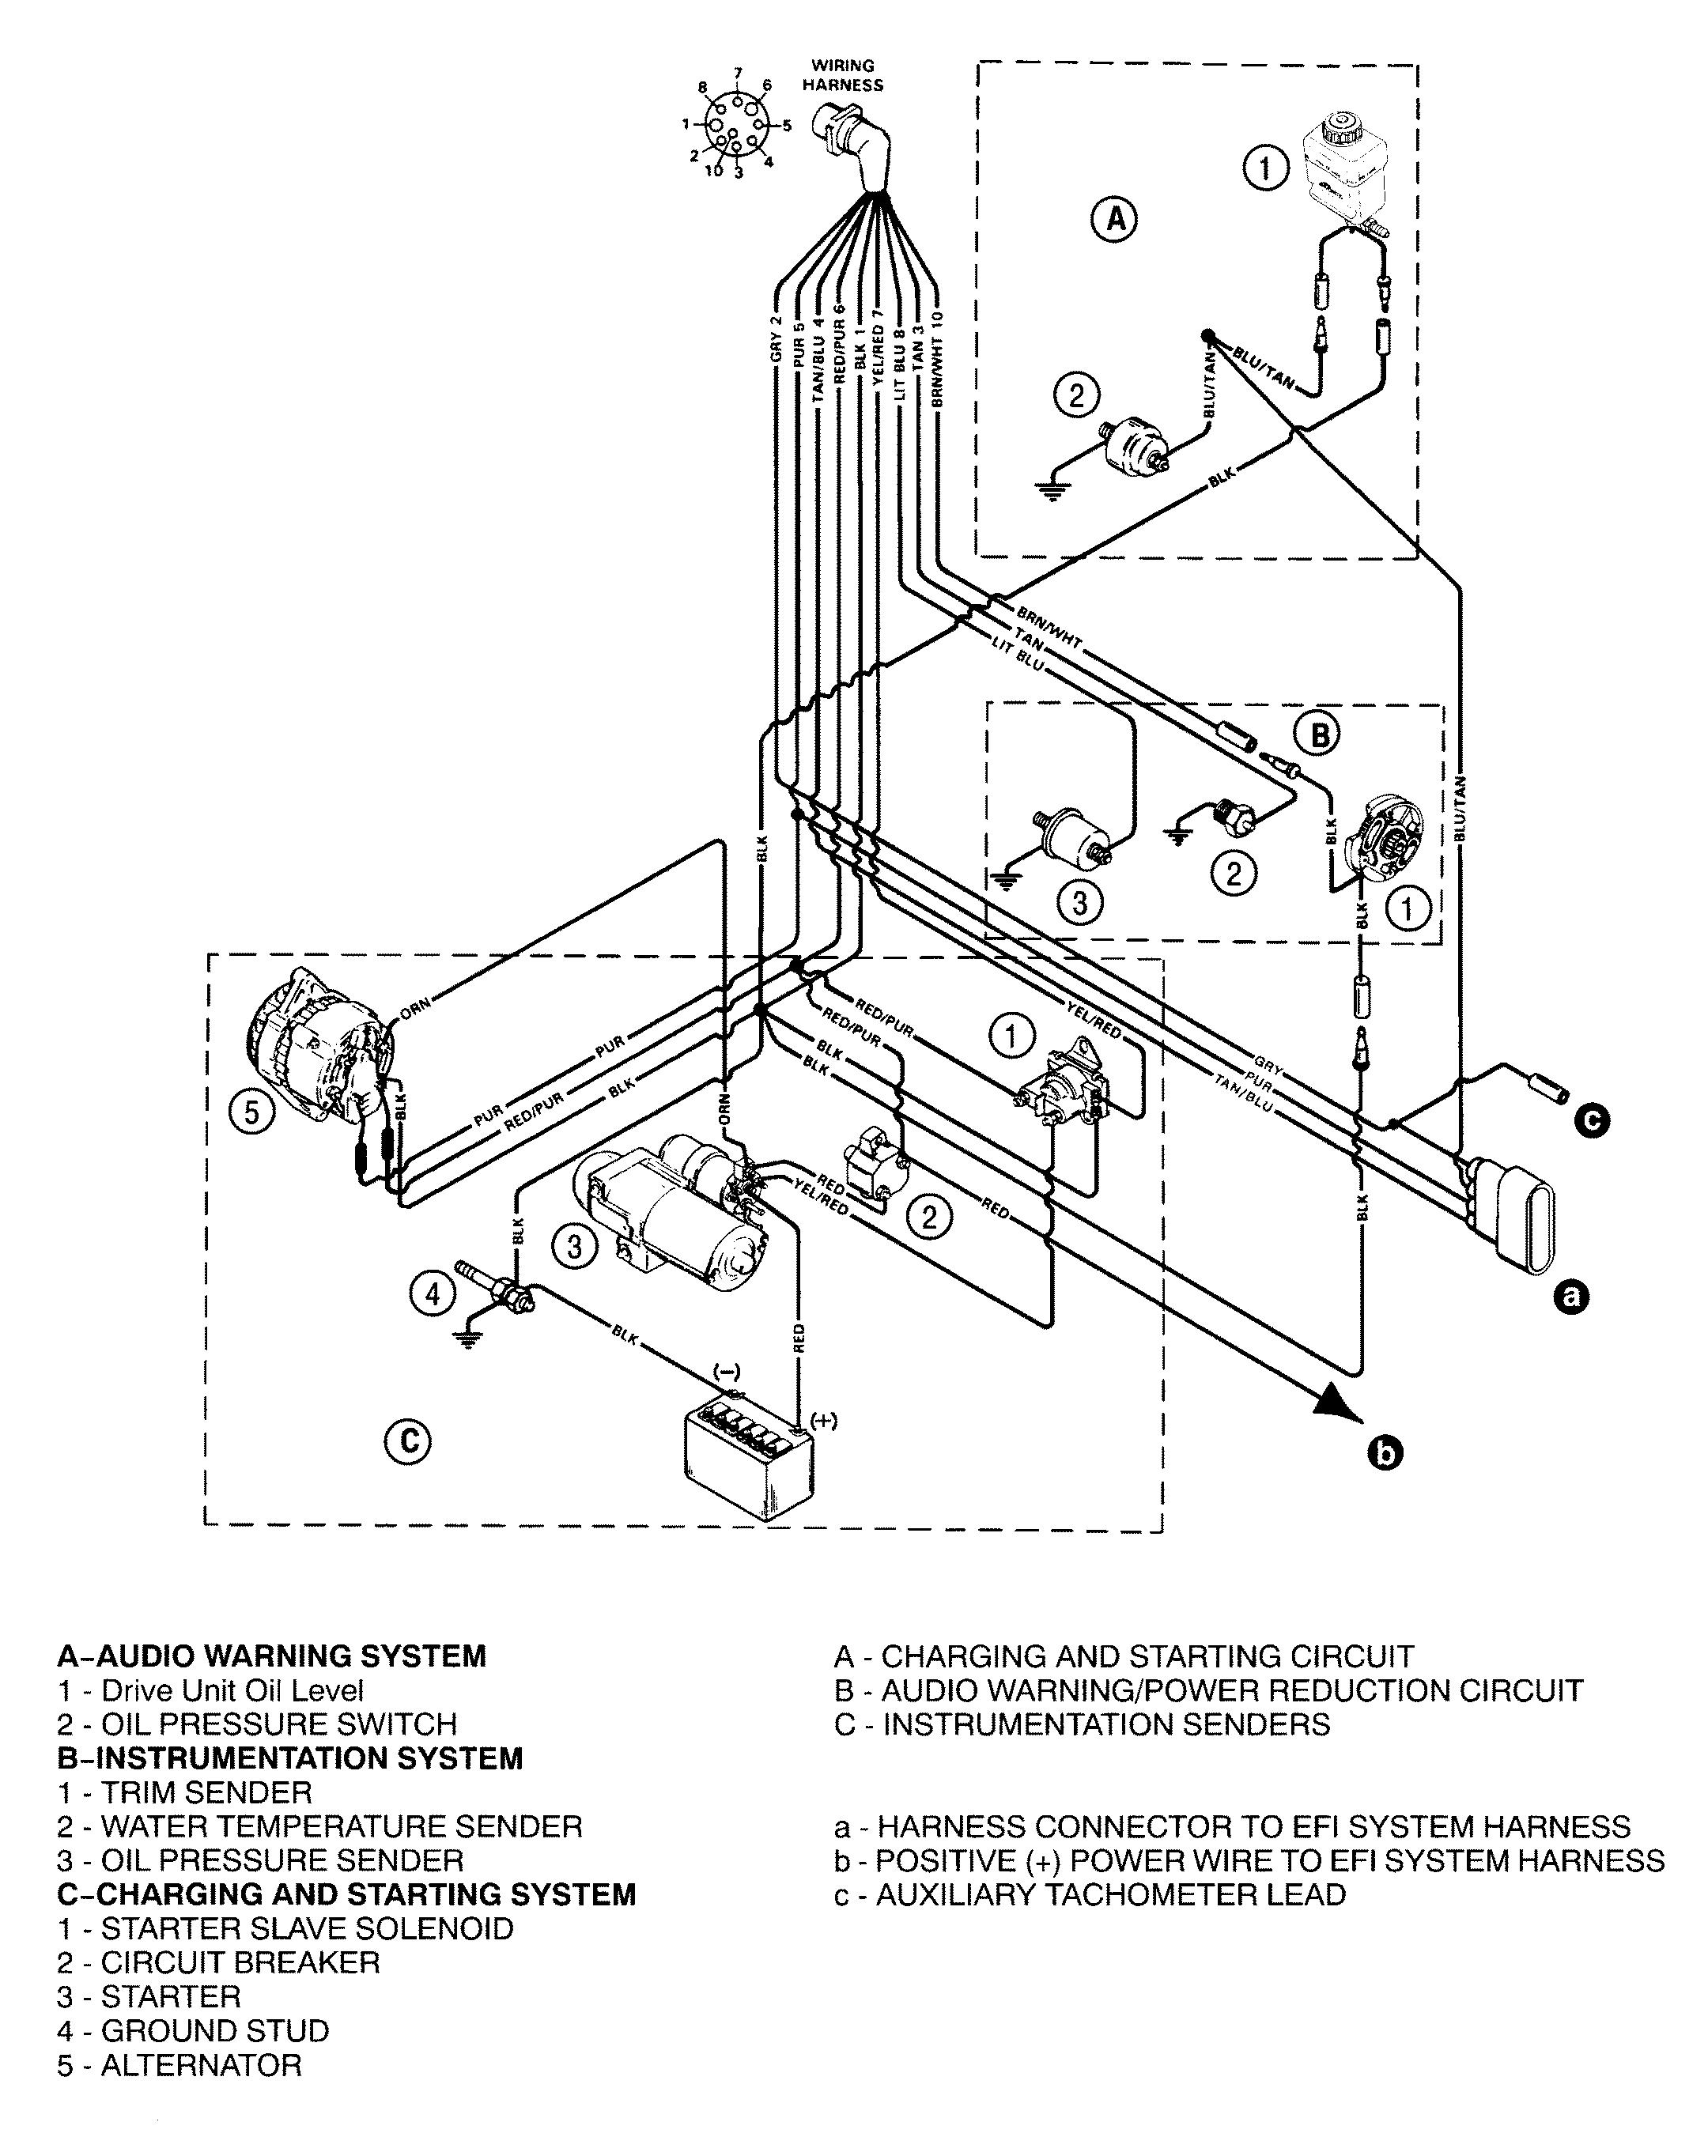 Mercruiser 5 7 Efi Wiring Harness Diagram: ?